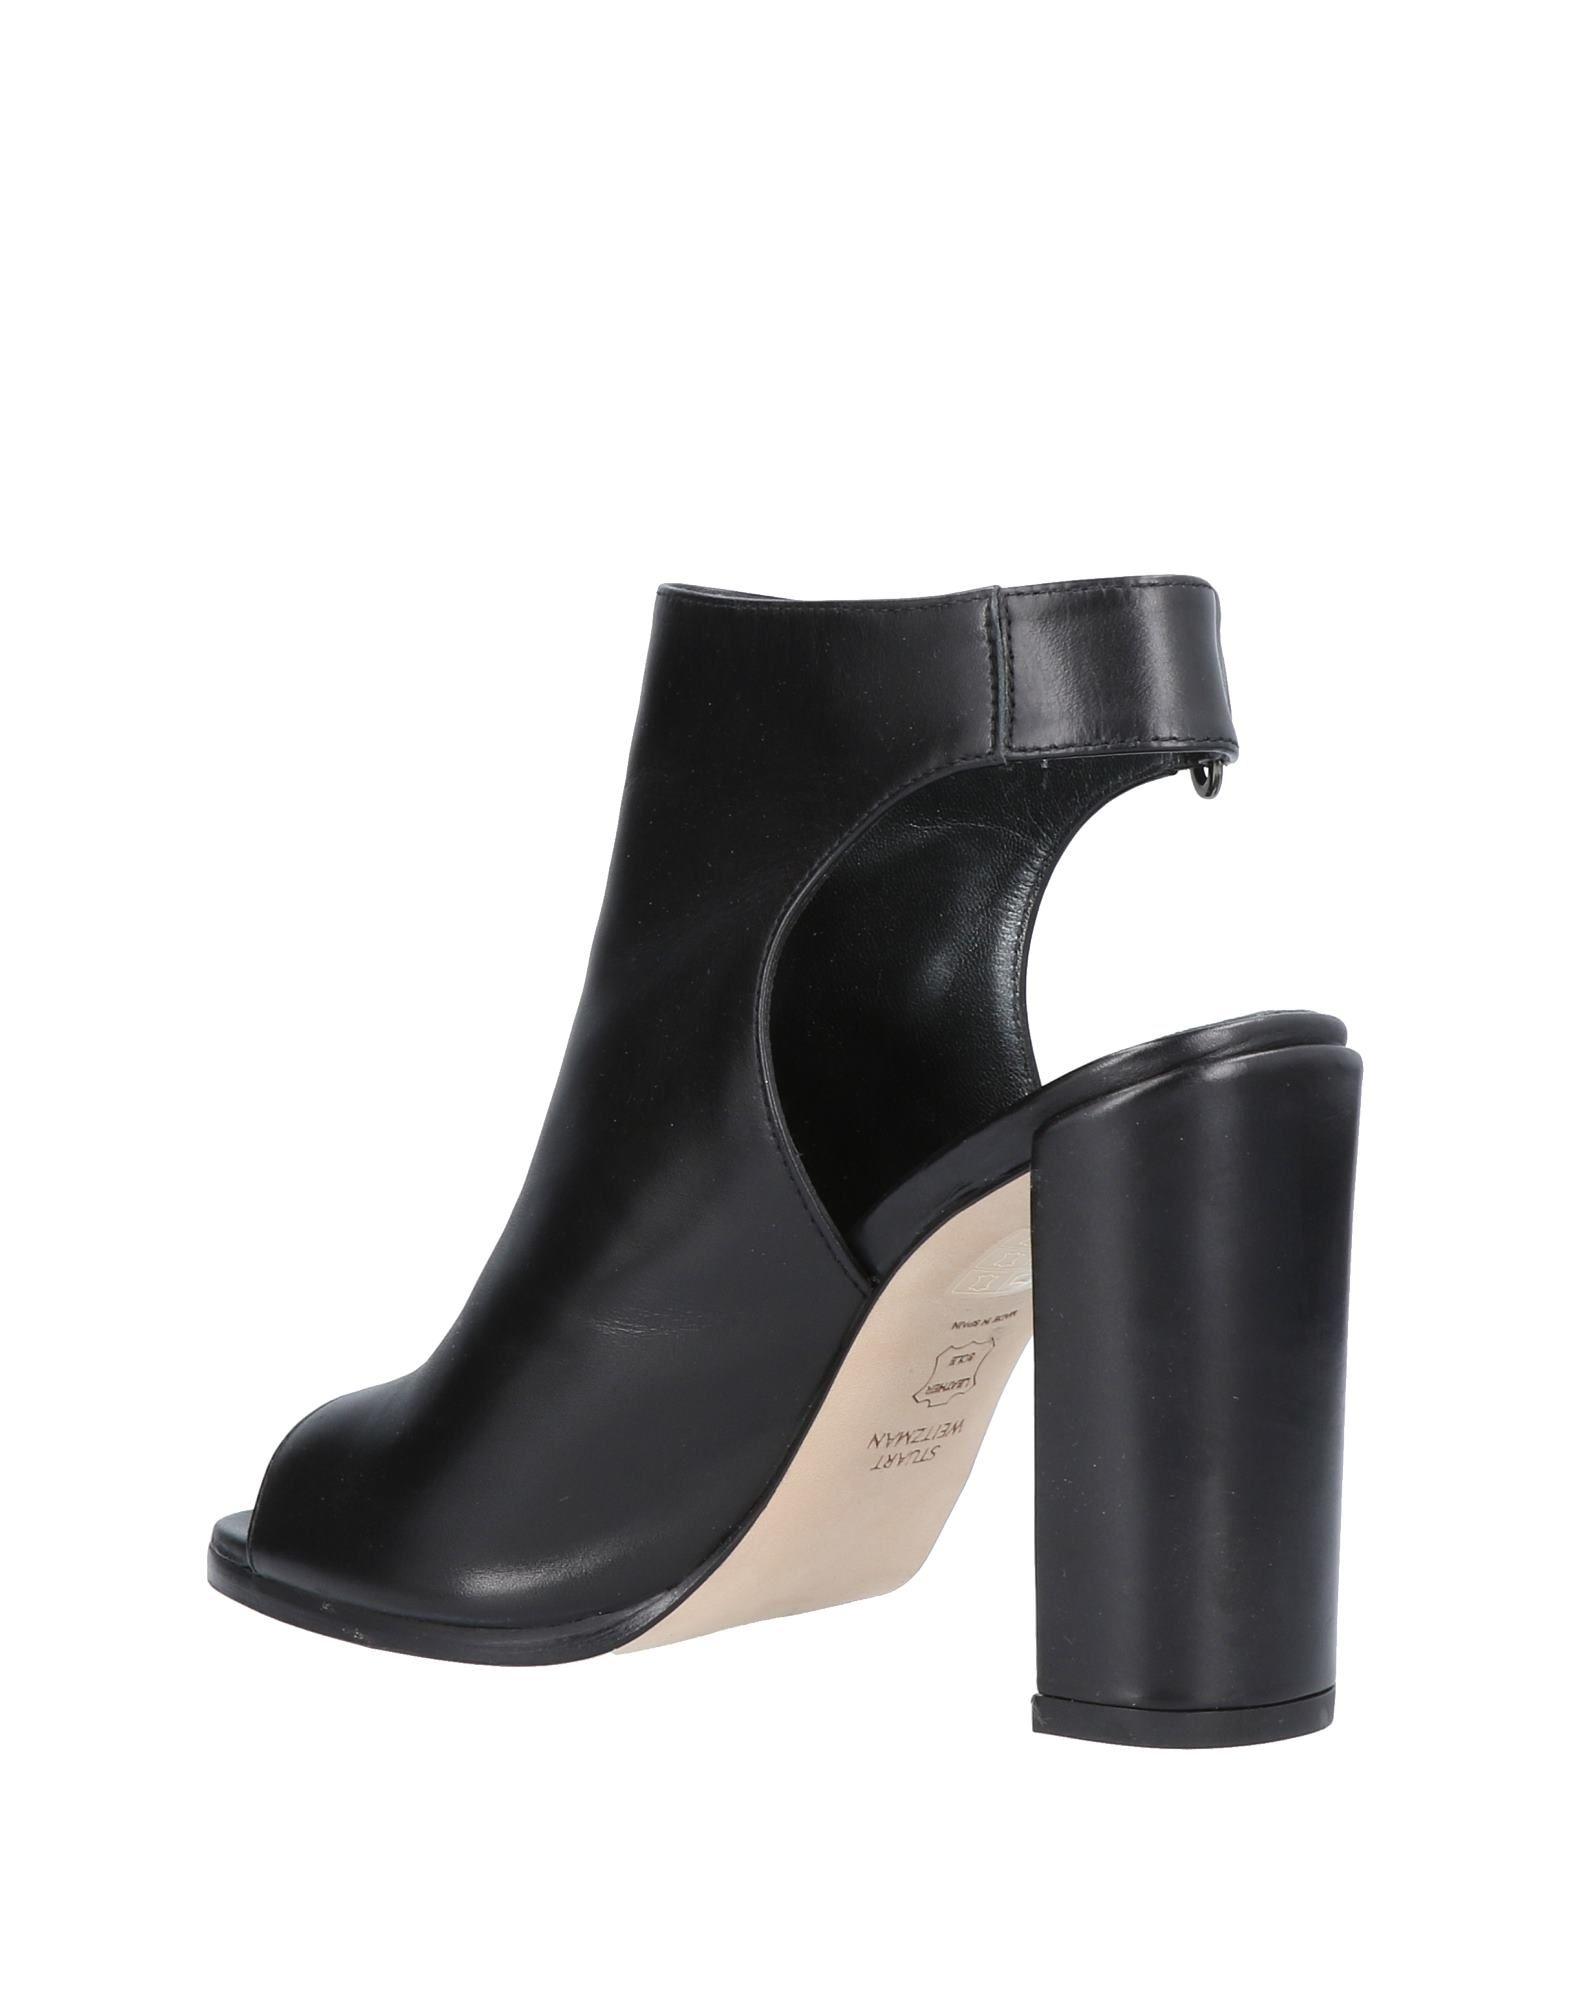 Stuart Stuart Stuart Weitzman Sandalen Damen  11462327VX Beliebte Schuhe e88132